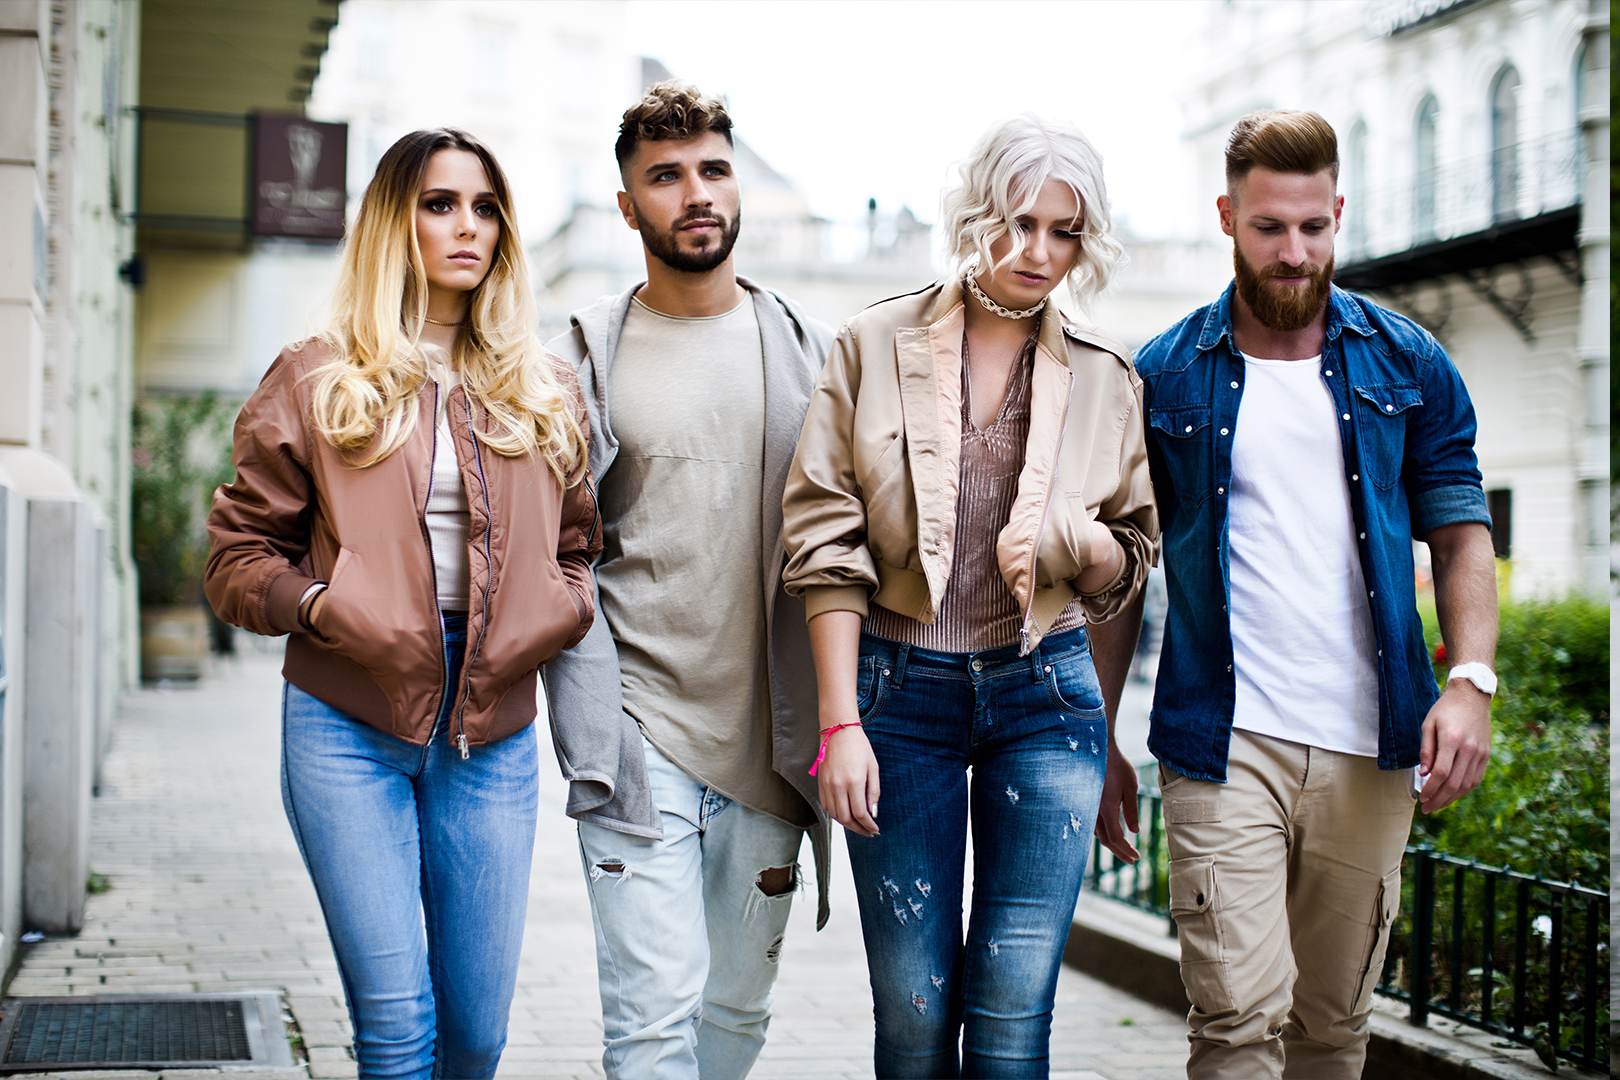 Unsere Street Style Kollektion